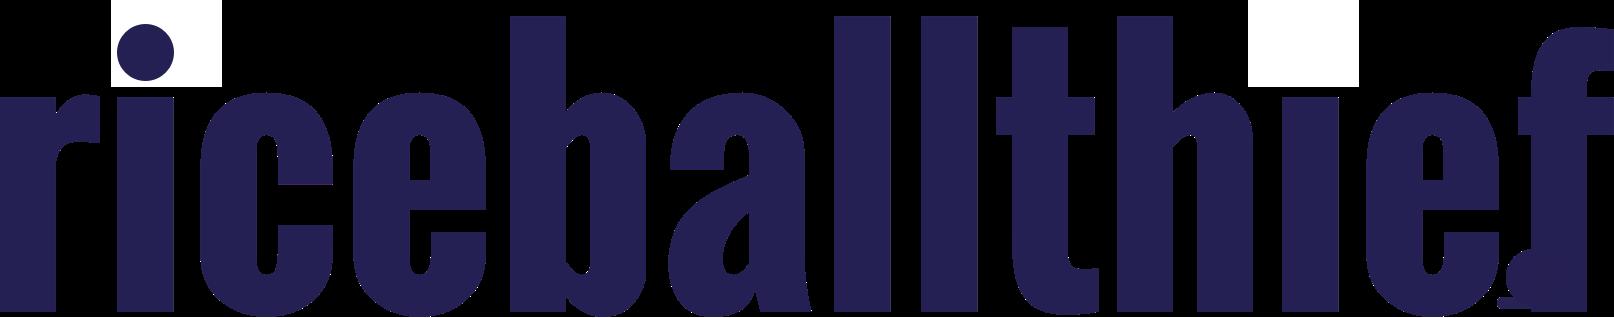 riceballthief logo